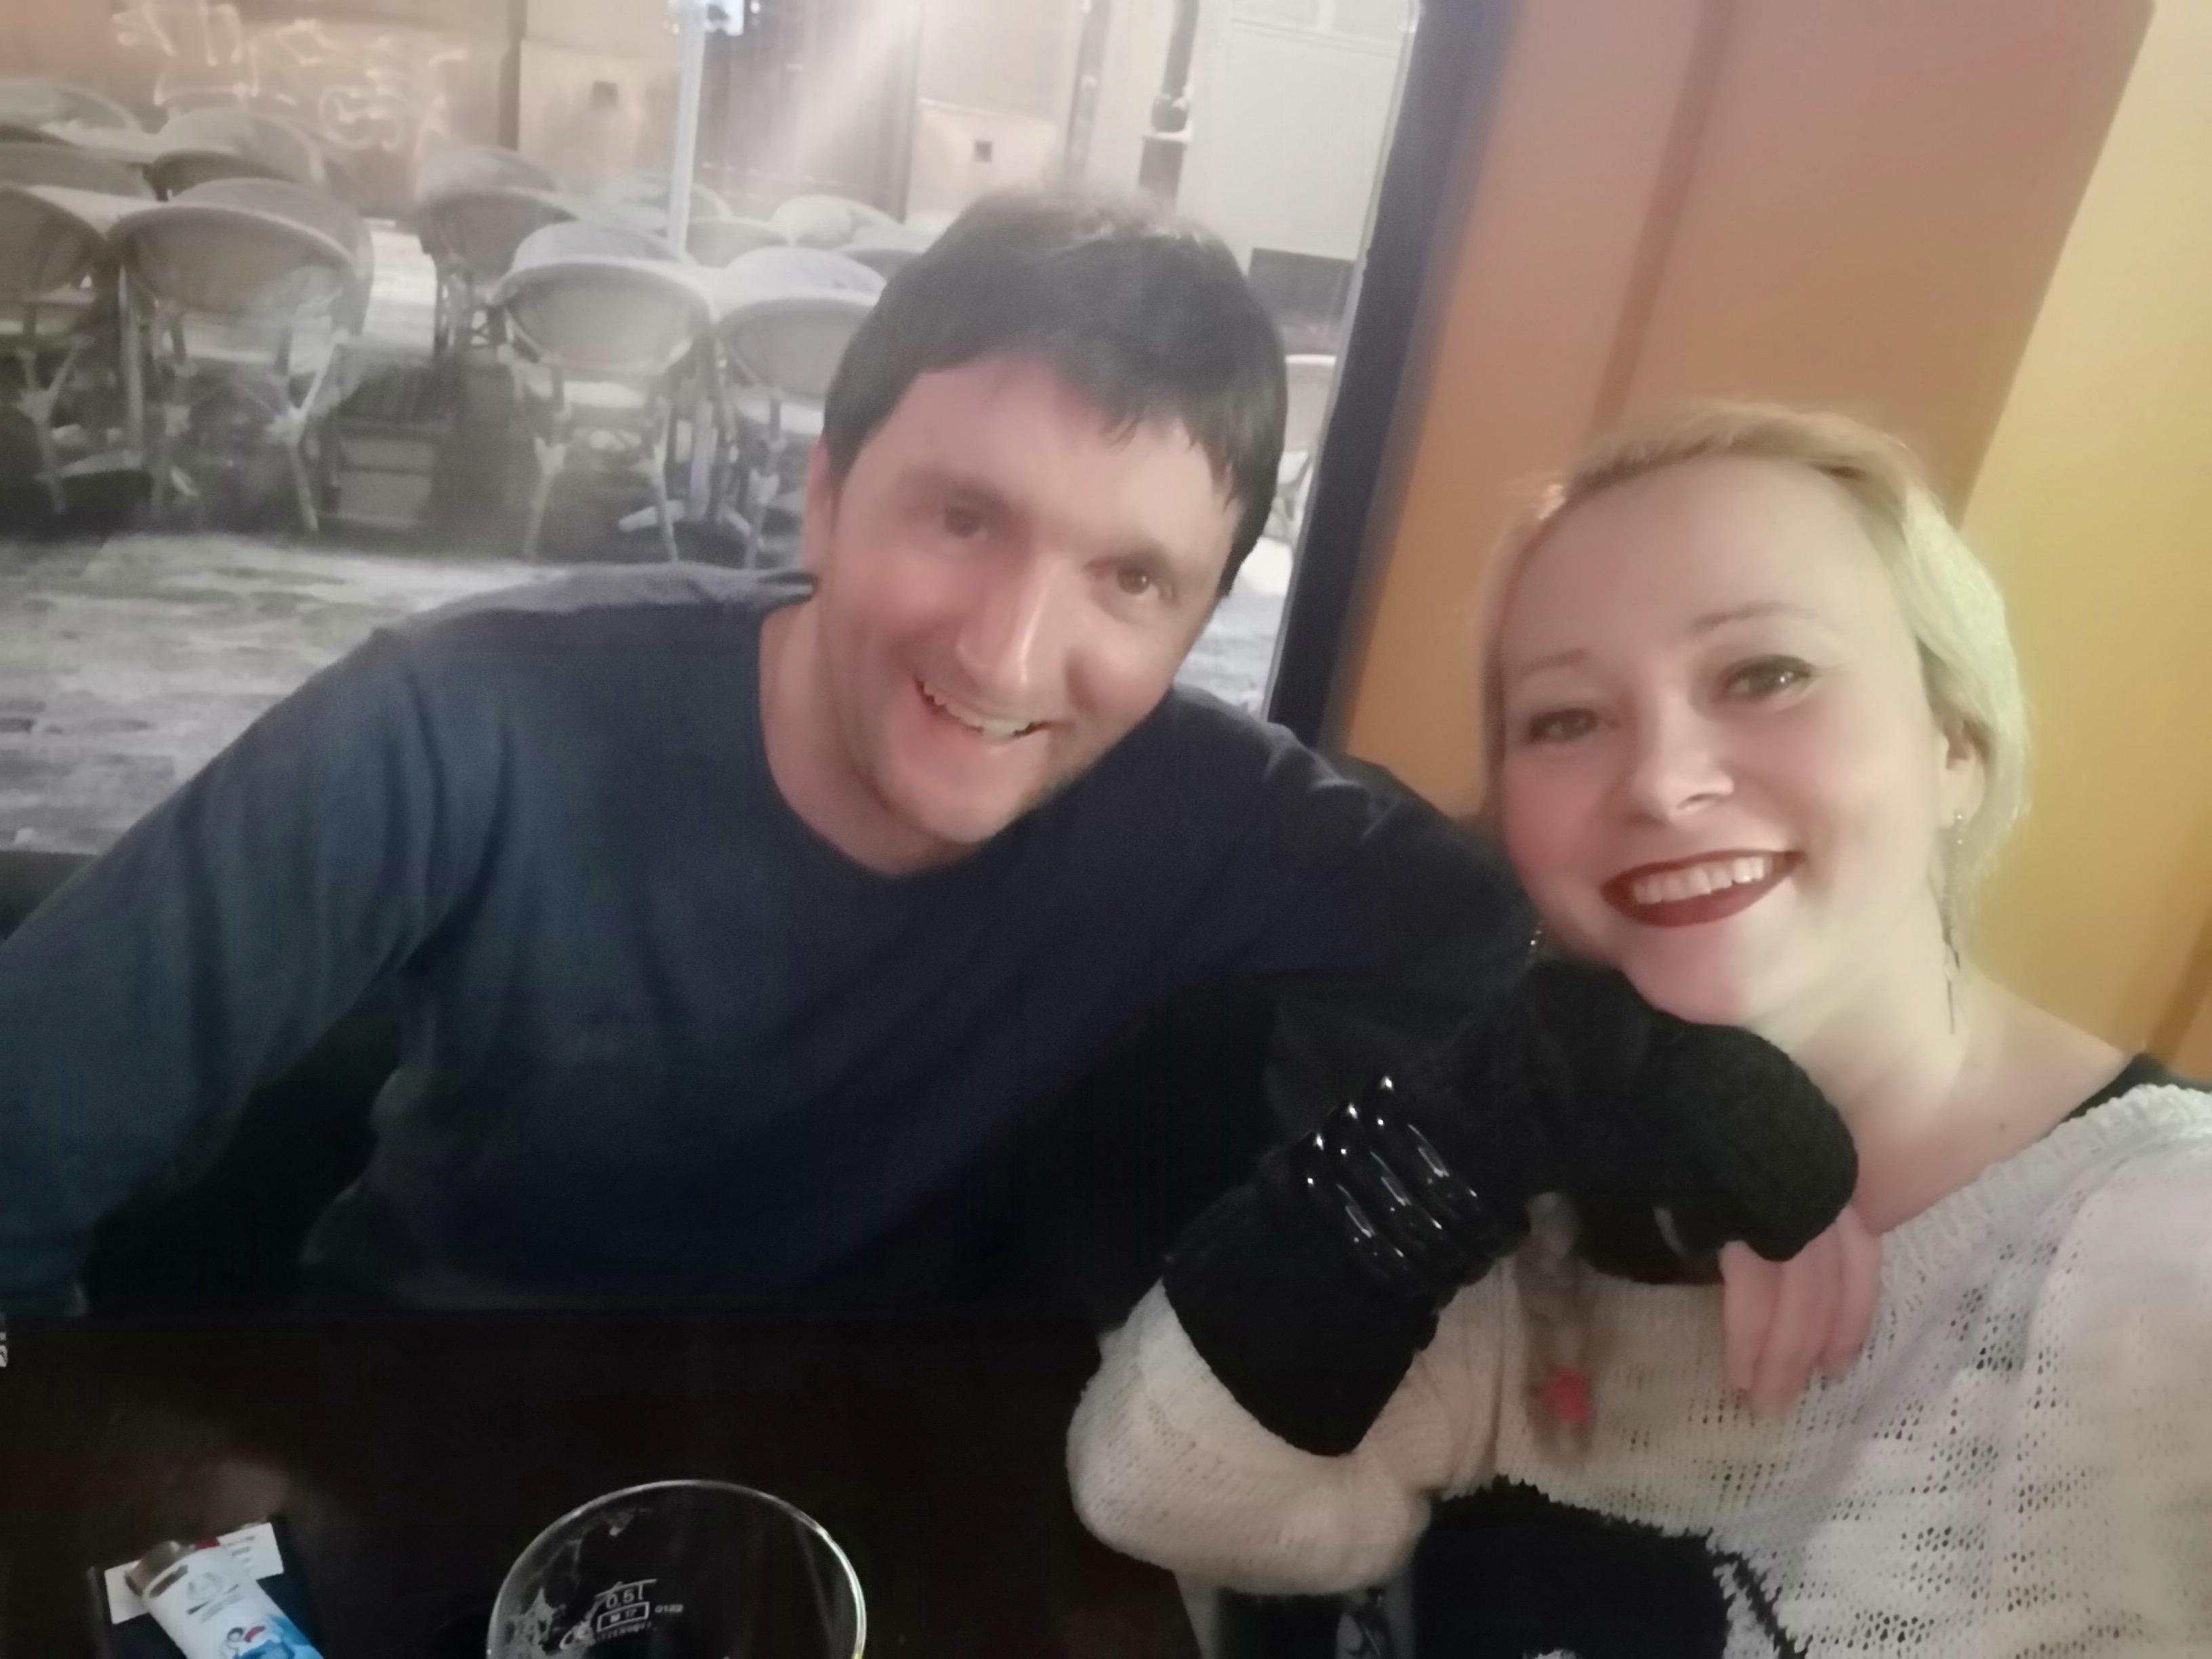 Miljan Paunović, politikolog, kopirajter i pisac: Ja sam zaljubljen i srećan čovek! (VIDEO)